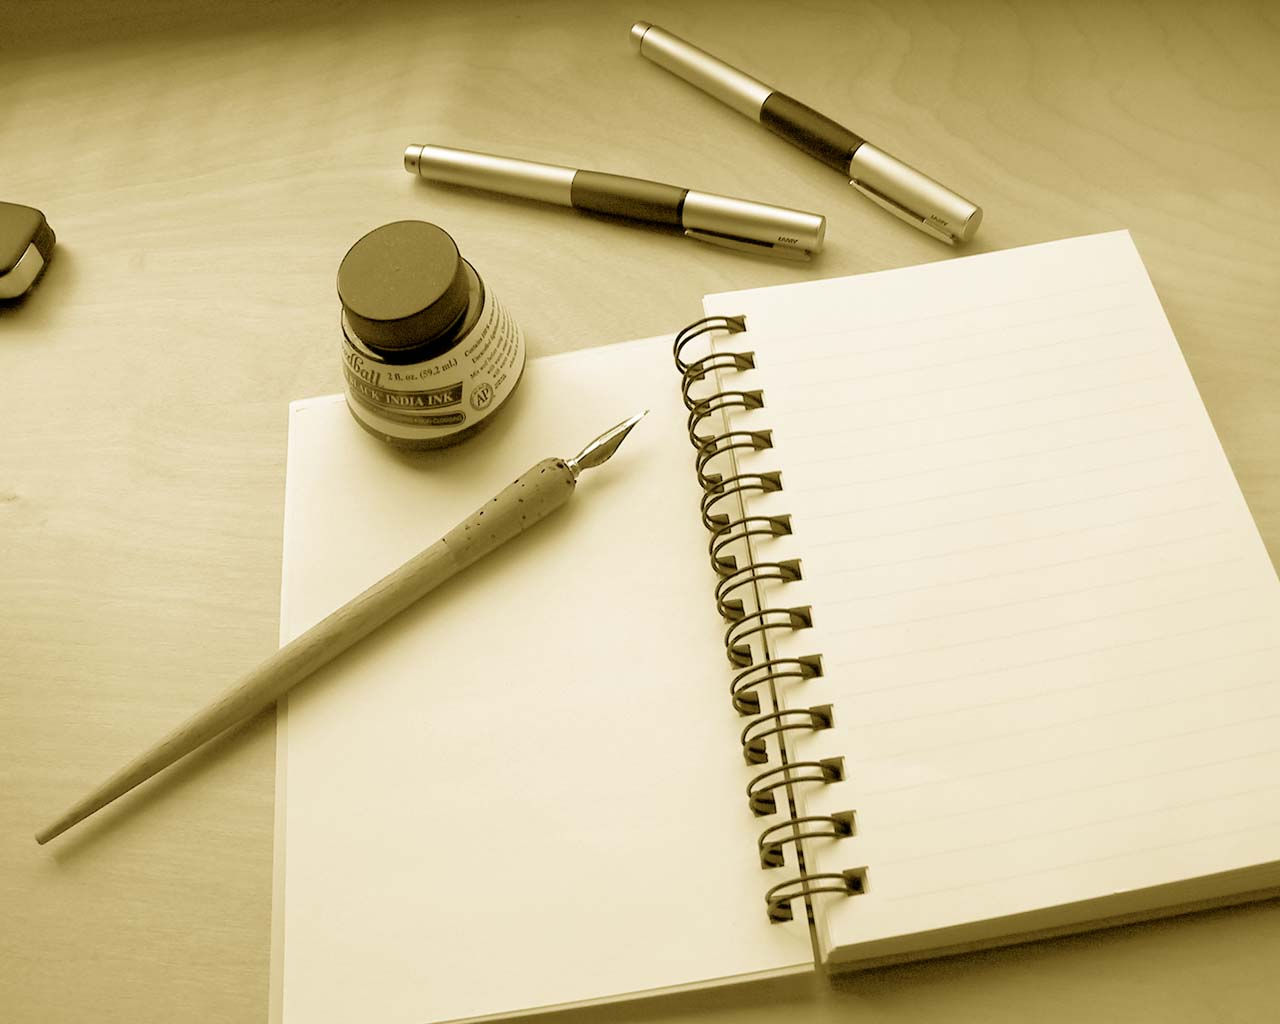 wix com twtwb novel study created by kathrynme based on pro writing 2